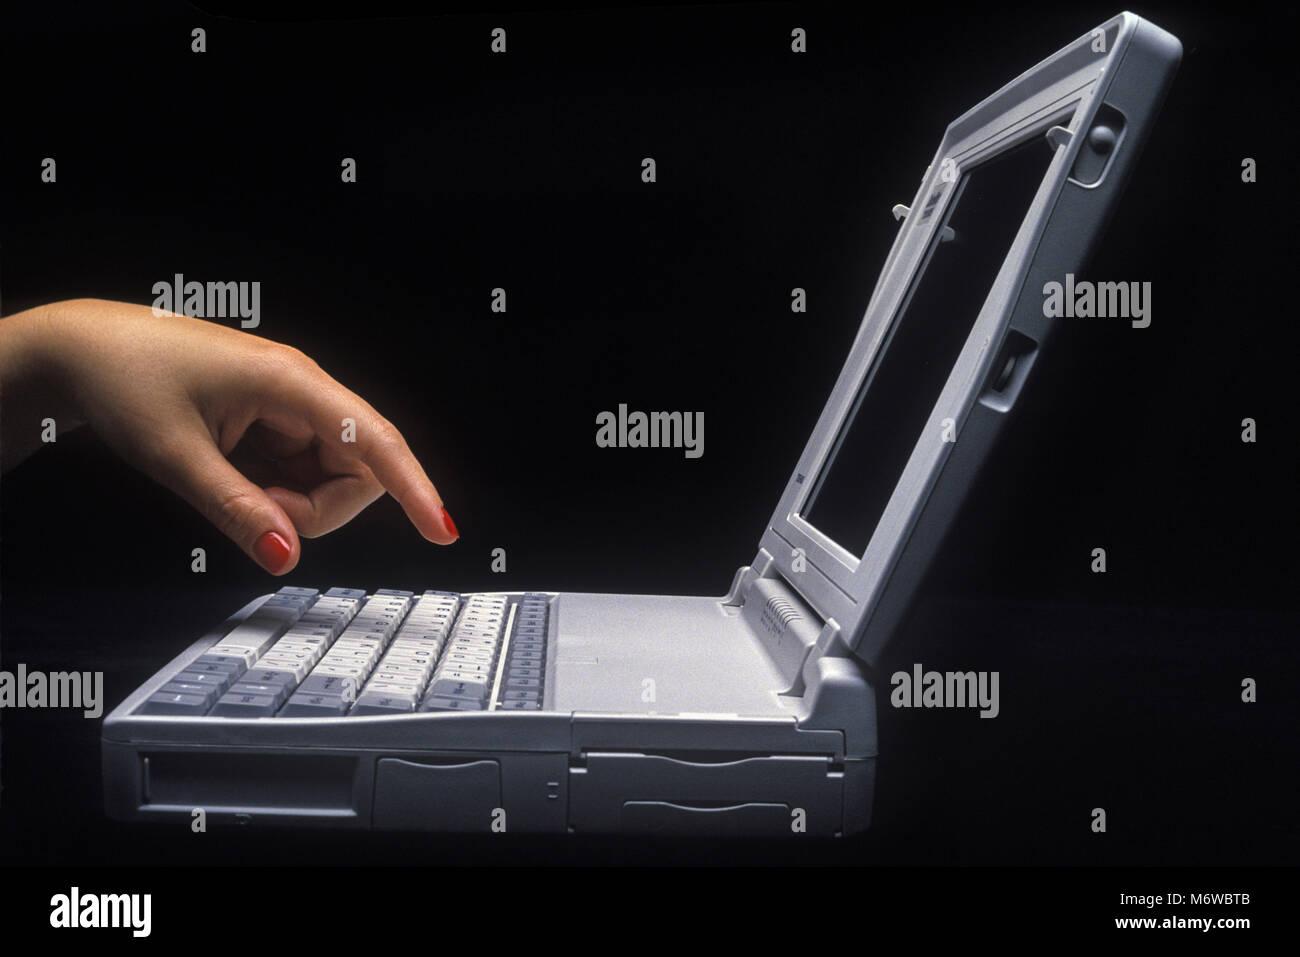 Mechanical Keyboard Stock Photos & Mechanical Keyboard Stock Images